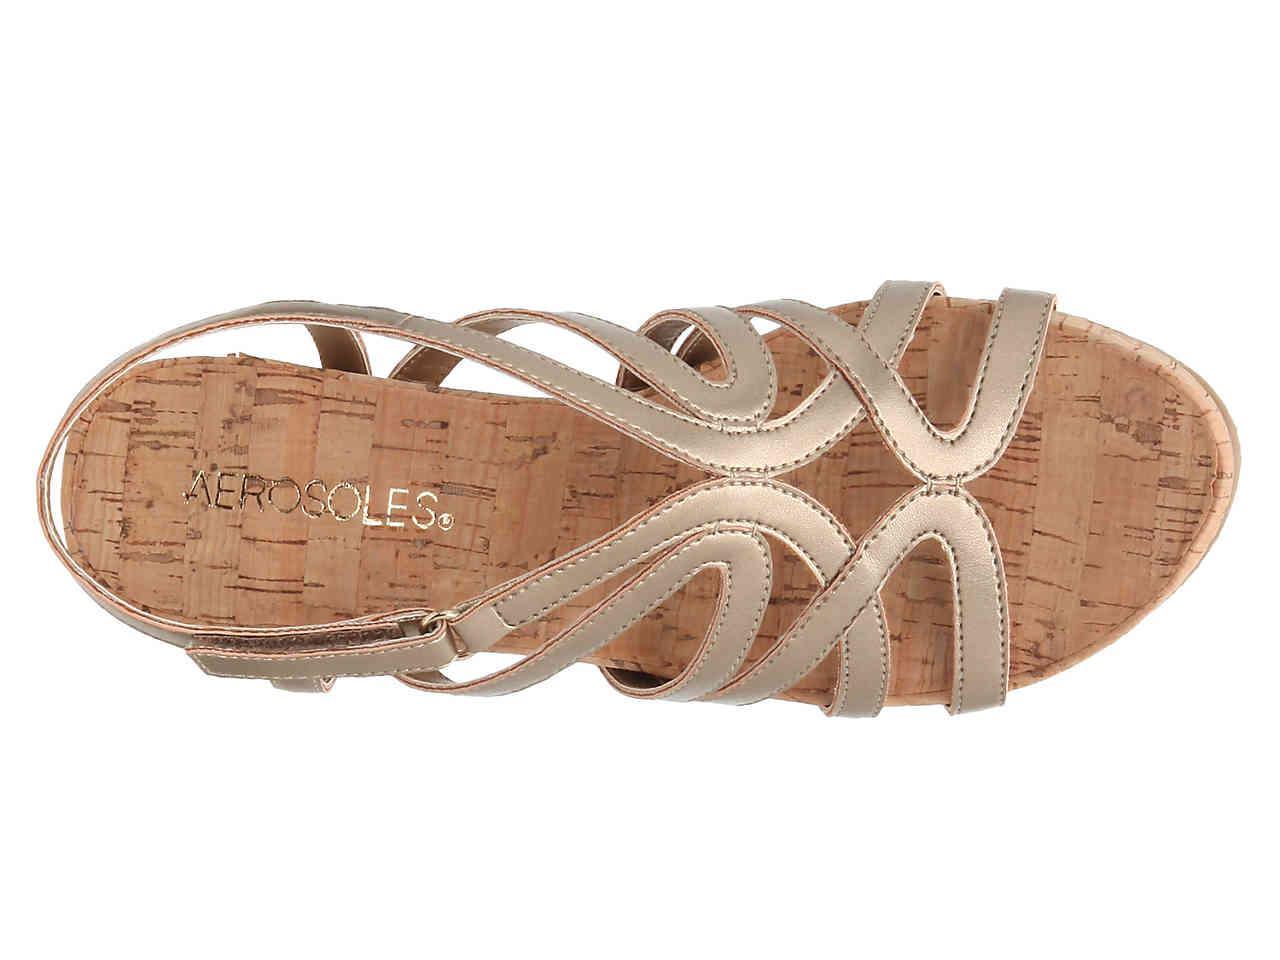 8fbf1649498 Aerosoles - Metallic Lux Plush Wedge Sandal - Lyst. View fullscreen